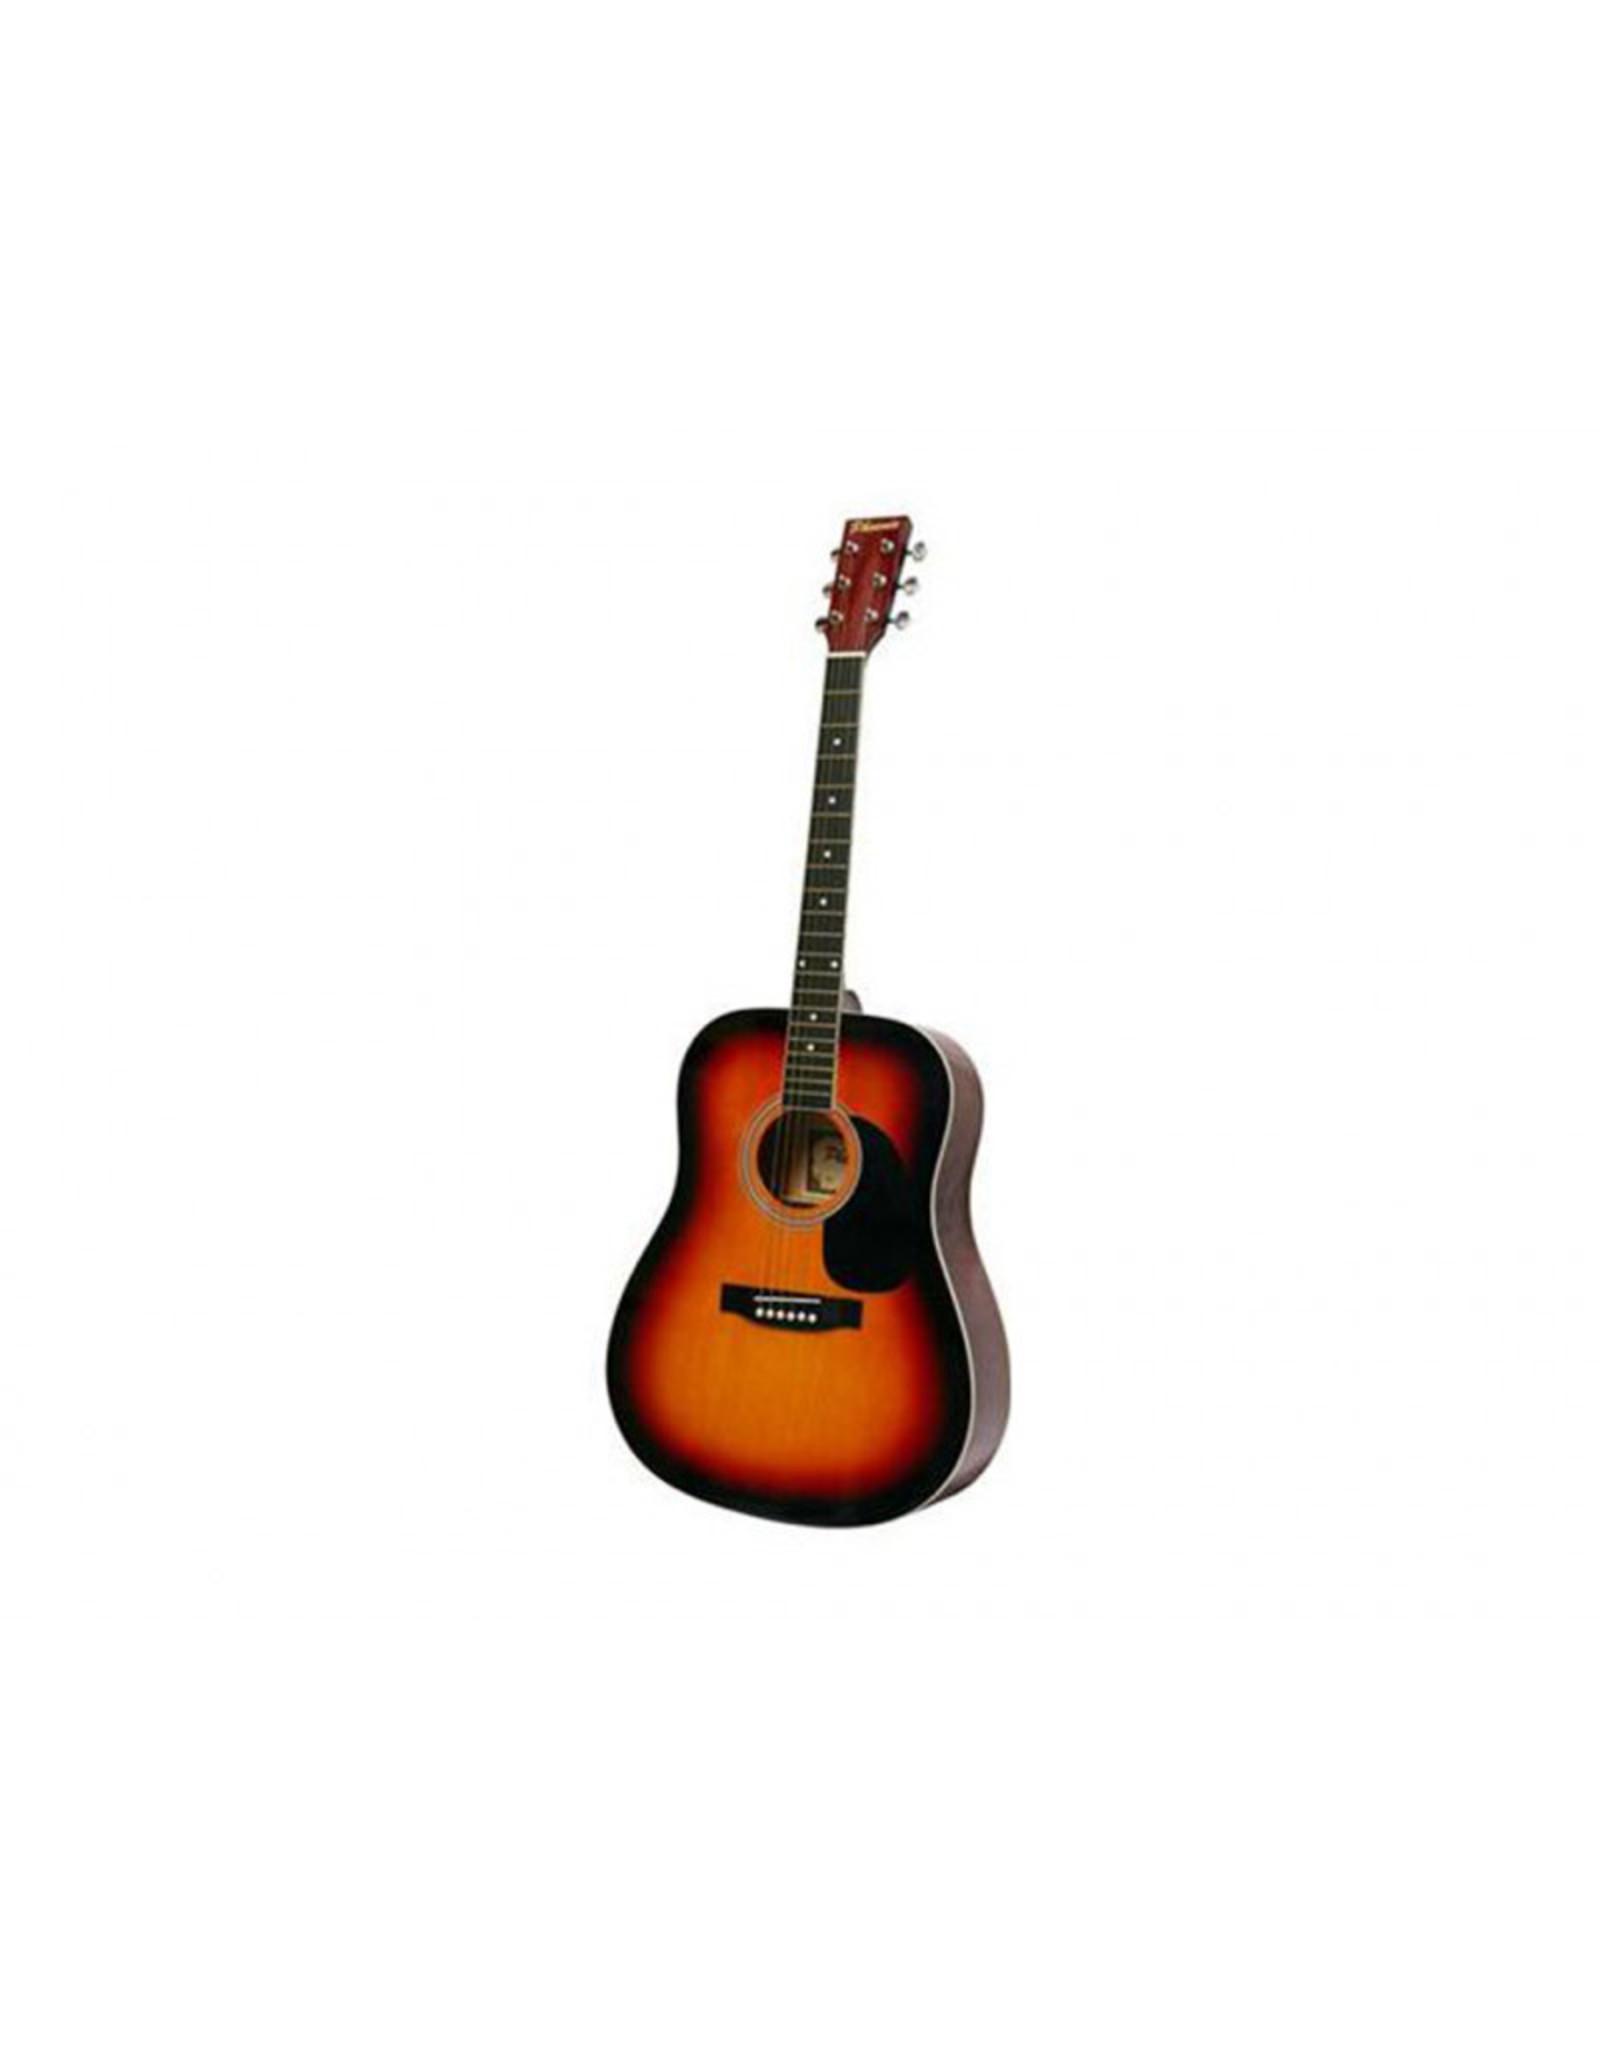 Phoenix Phoenix Western Guitar 001 Vintage Sunburst